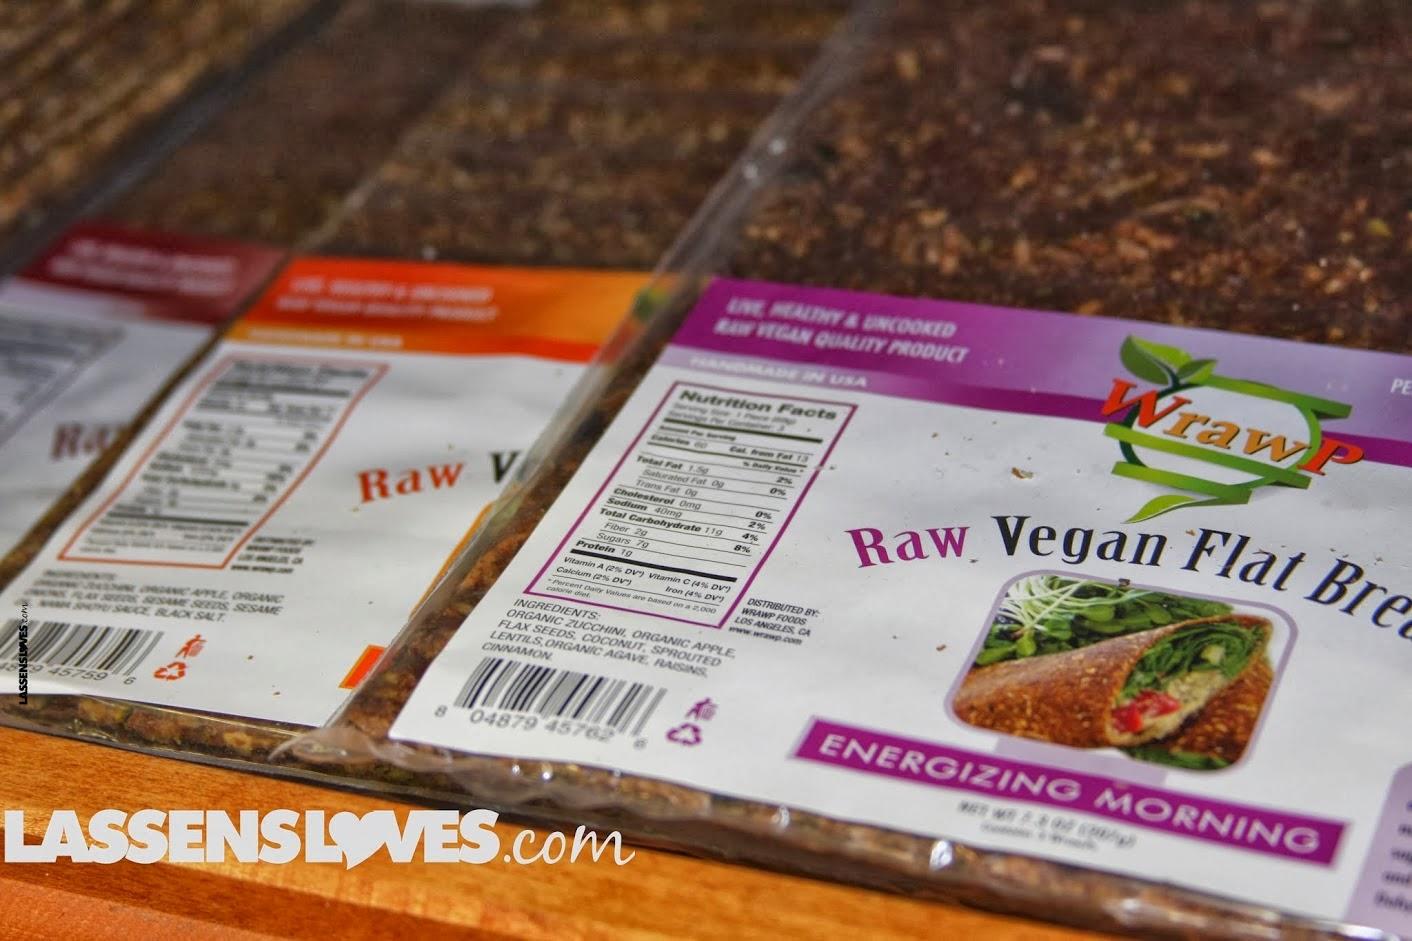 lassensloves.com, Lassen's, Lassens, Los+Feliz Manager+Spotlight, Wraw+Vegan+Flat+Bread